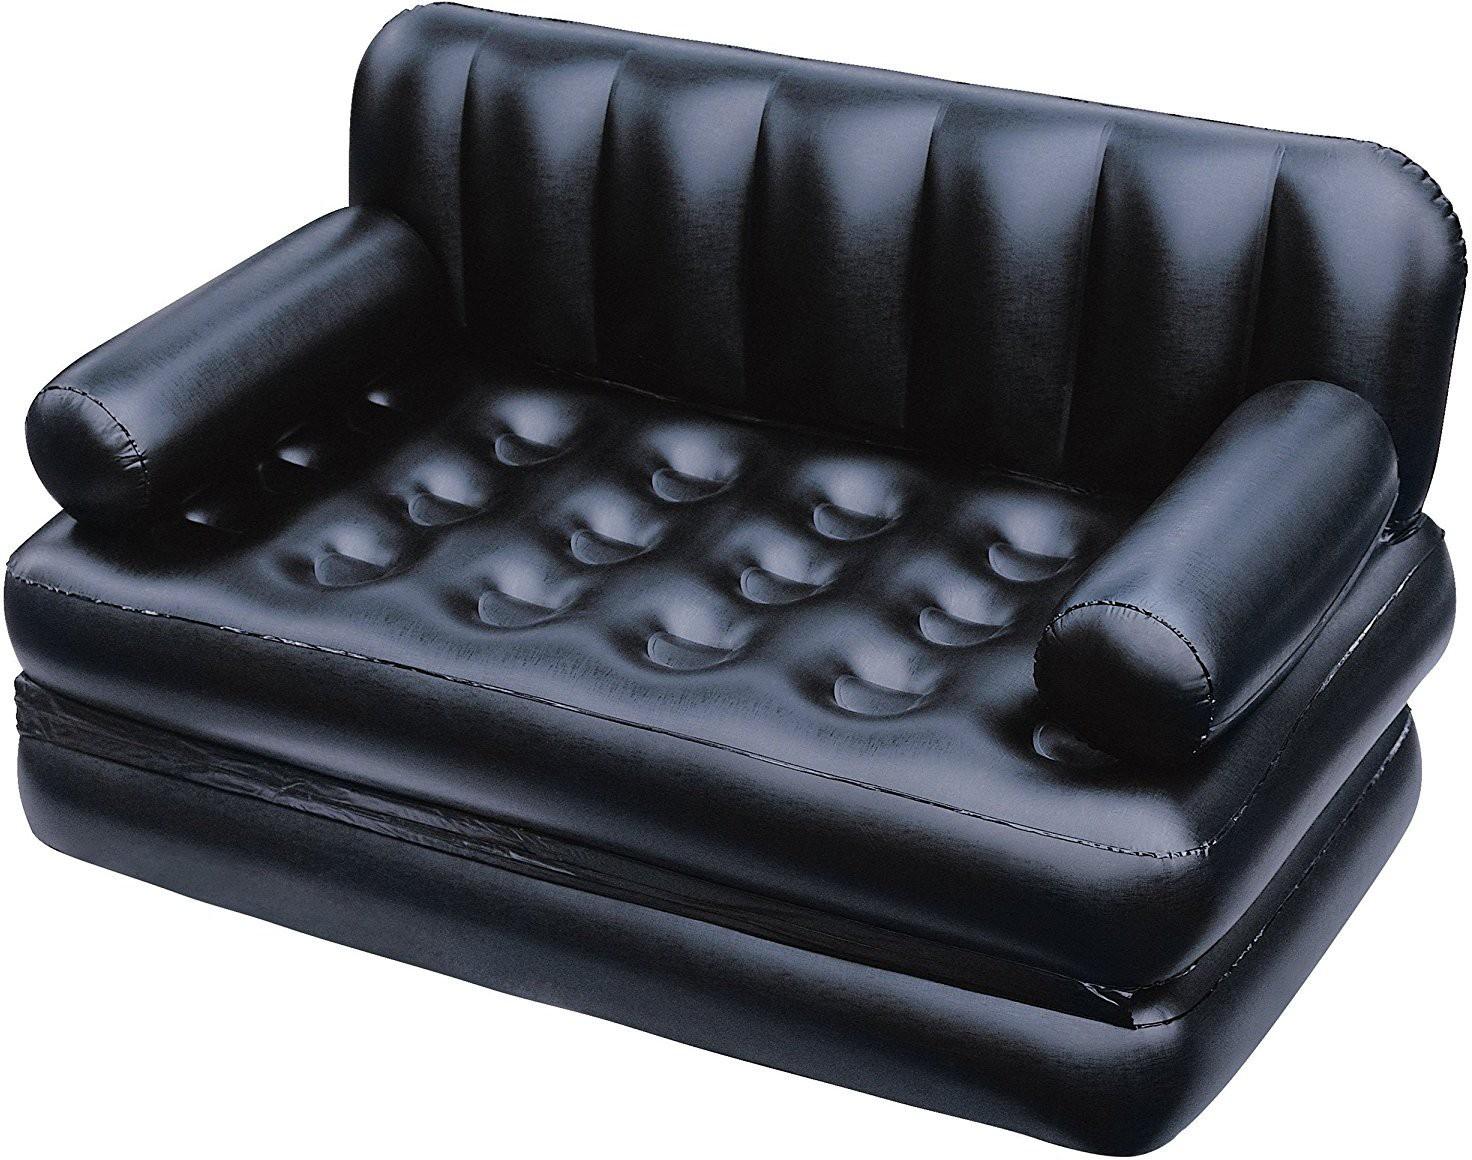 View Shrih PVC 3 Seater Inflatable Sofa(Color - Black) Furniture (Shrih)